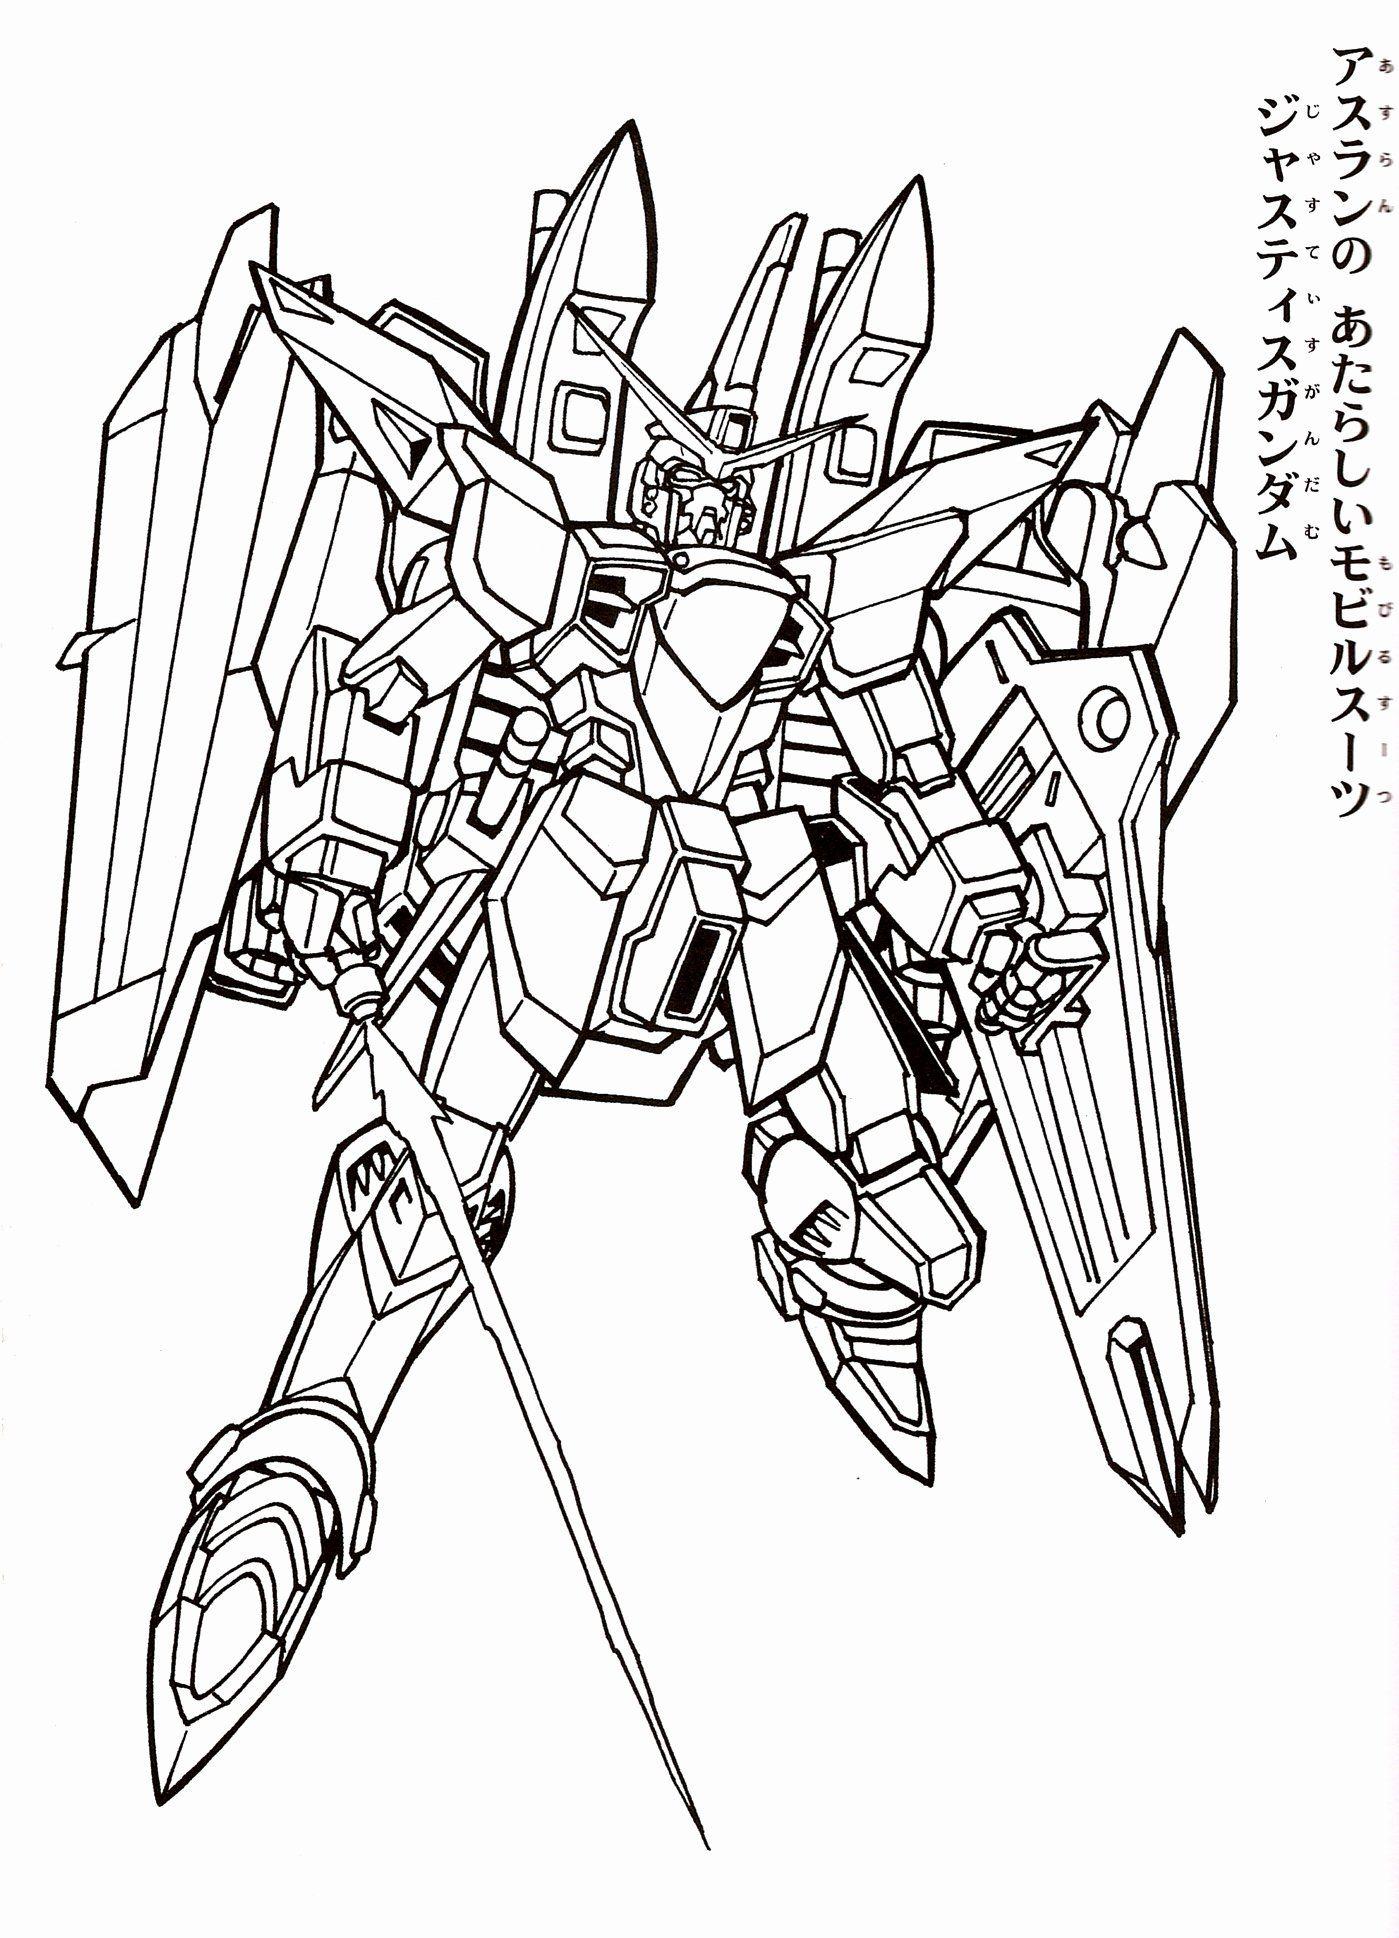 Gundam Coloring Pages : gundam, coloring, pages, Gundam, Coloring, Pages, Elegant, Pages,, Contest,